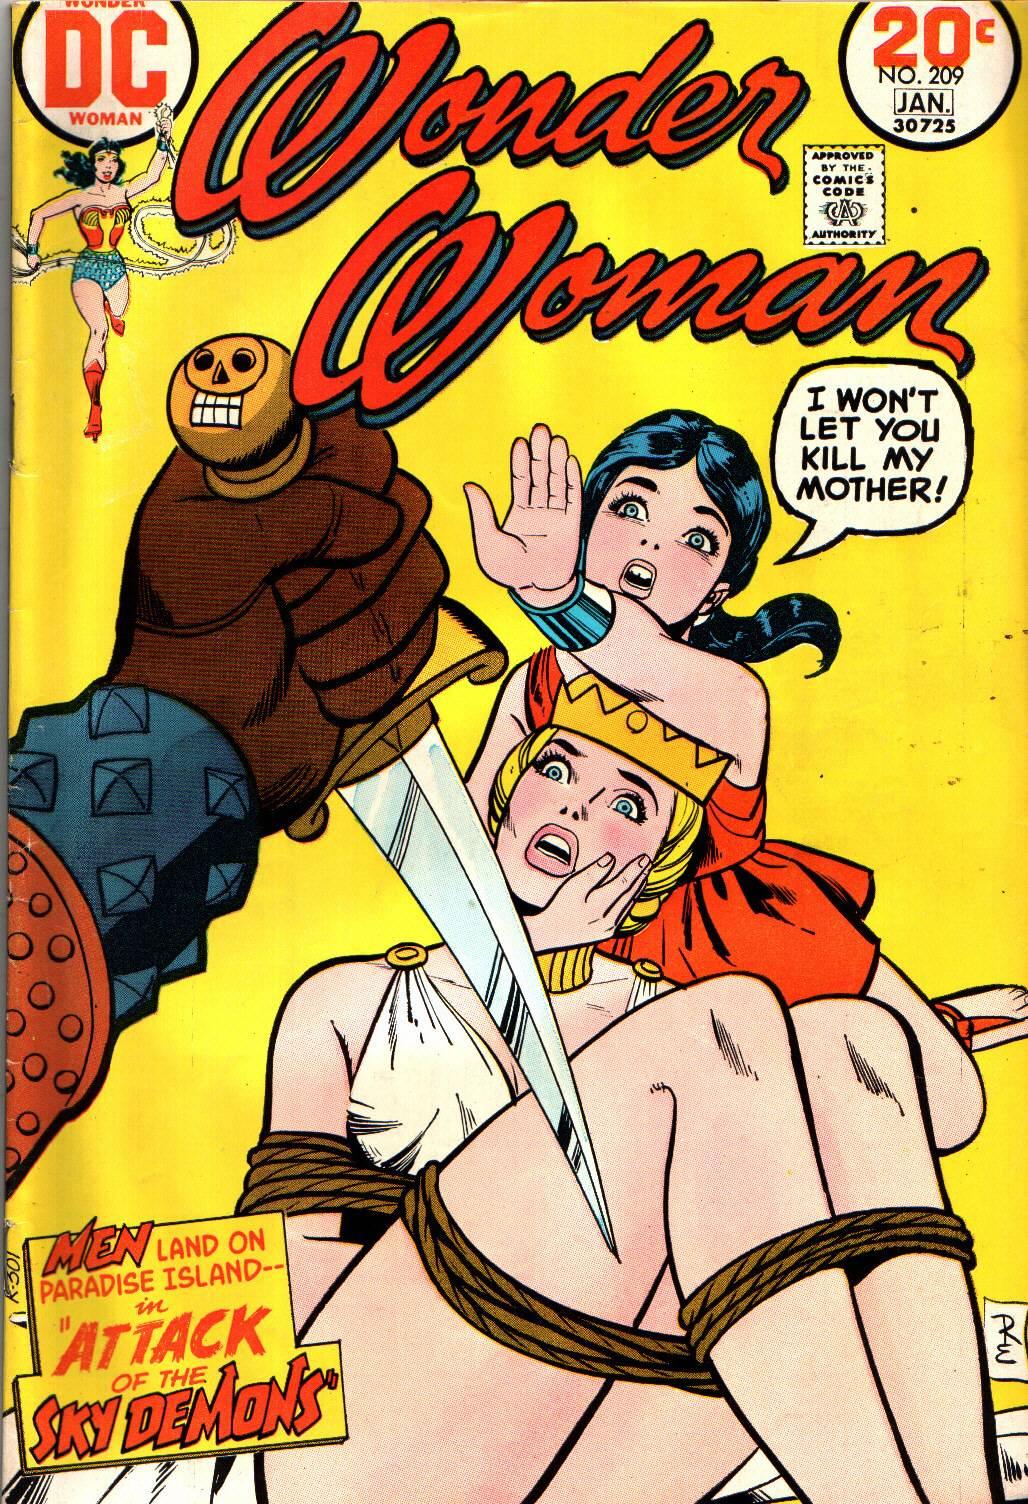 Read online Wonder Woman (1942) comic -  Issue #209 - 1